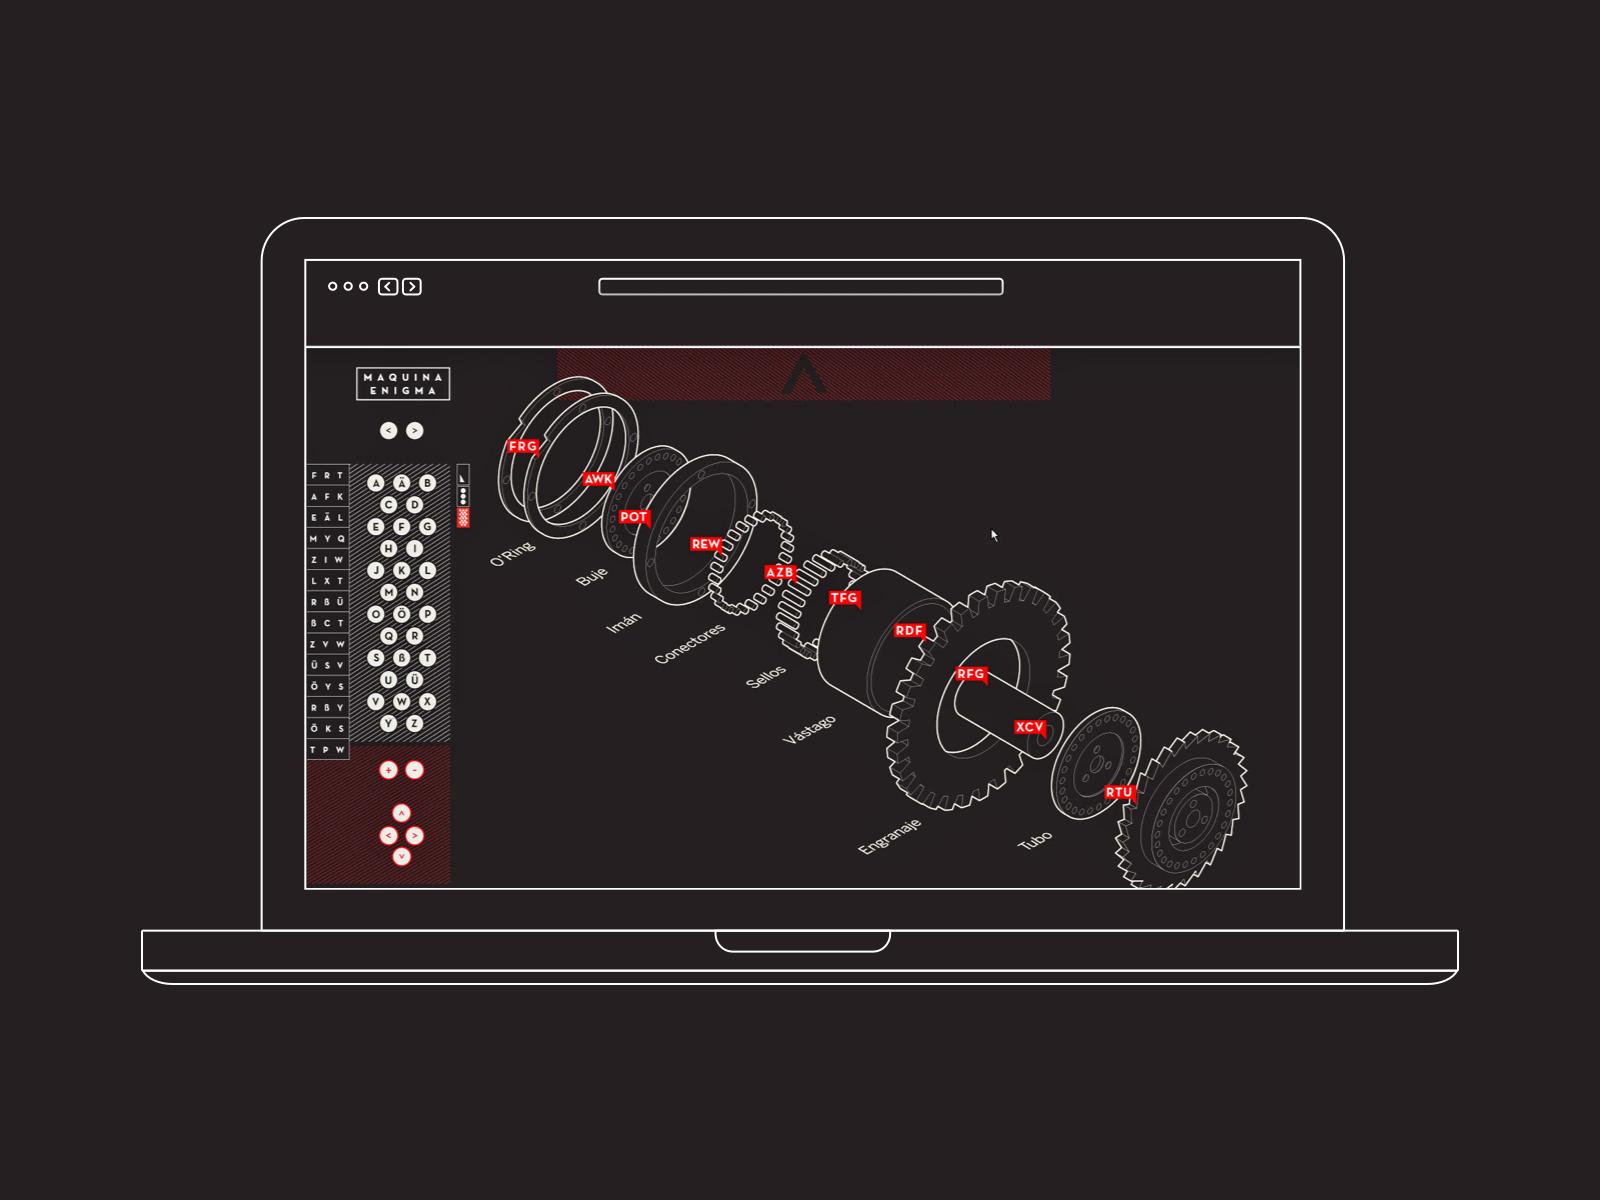 Enigma machine - Interactive website